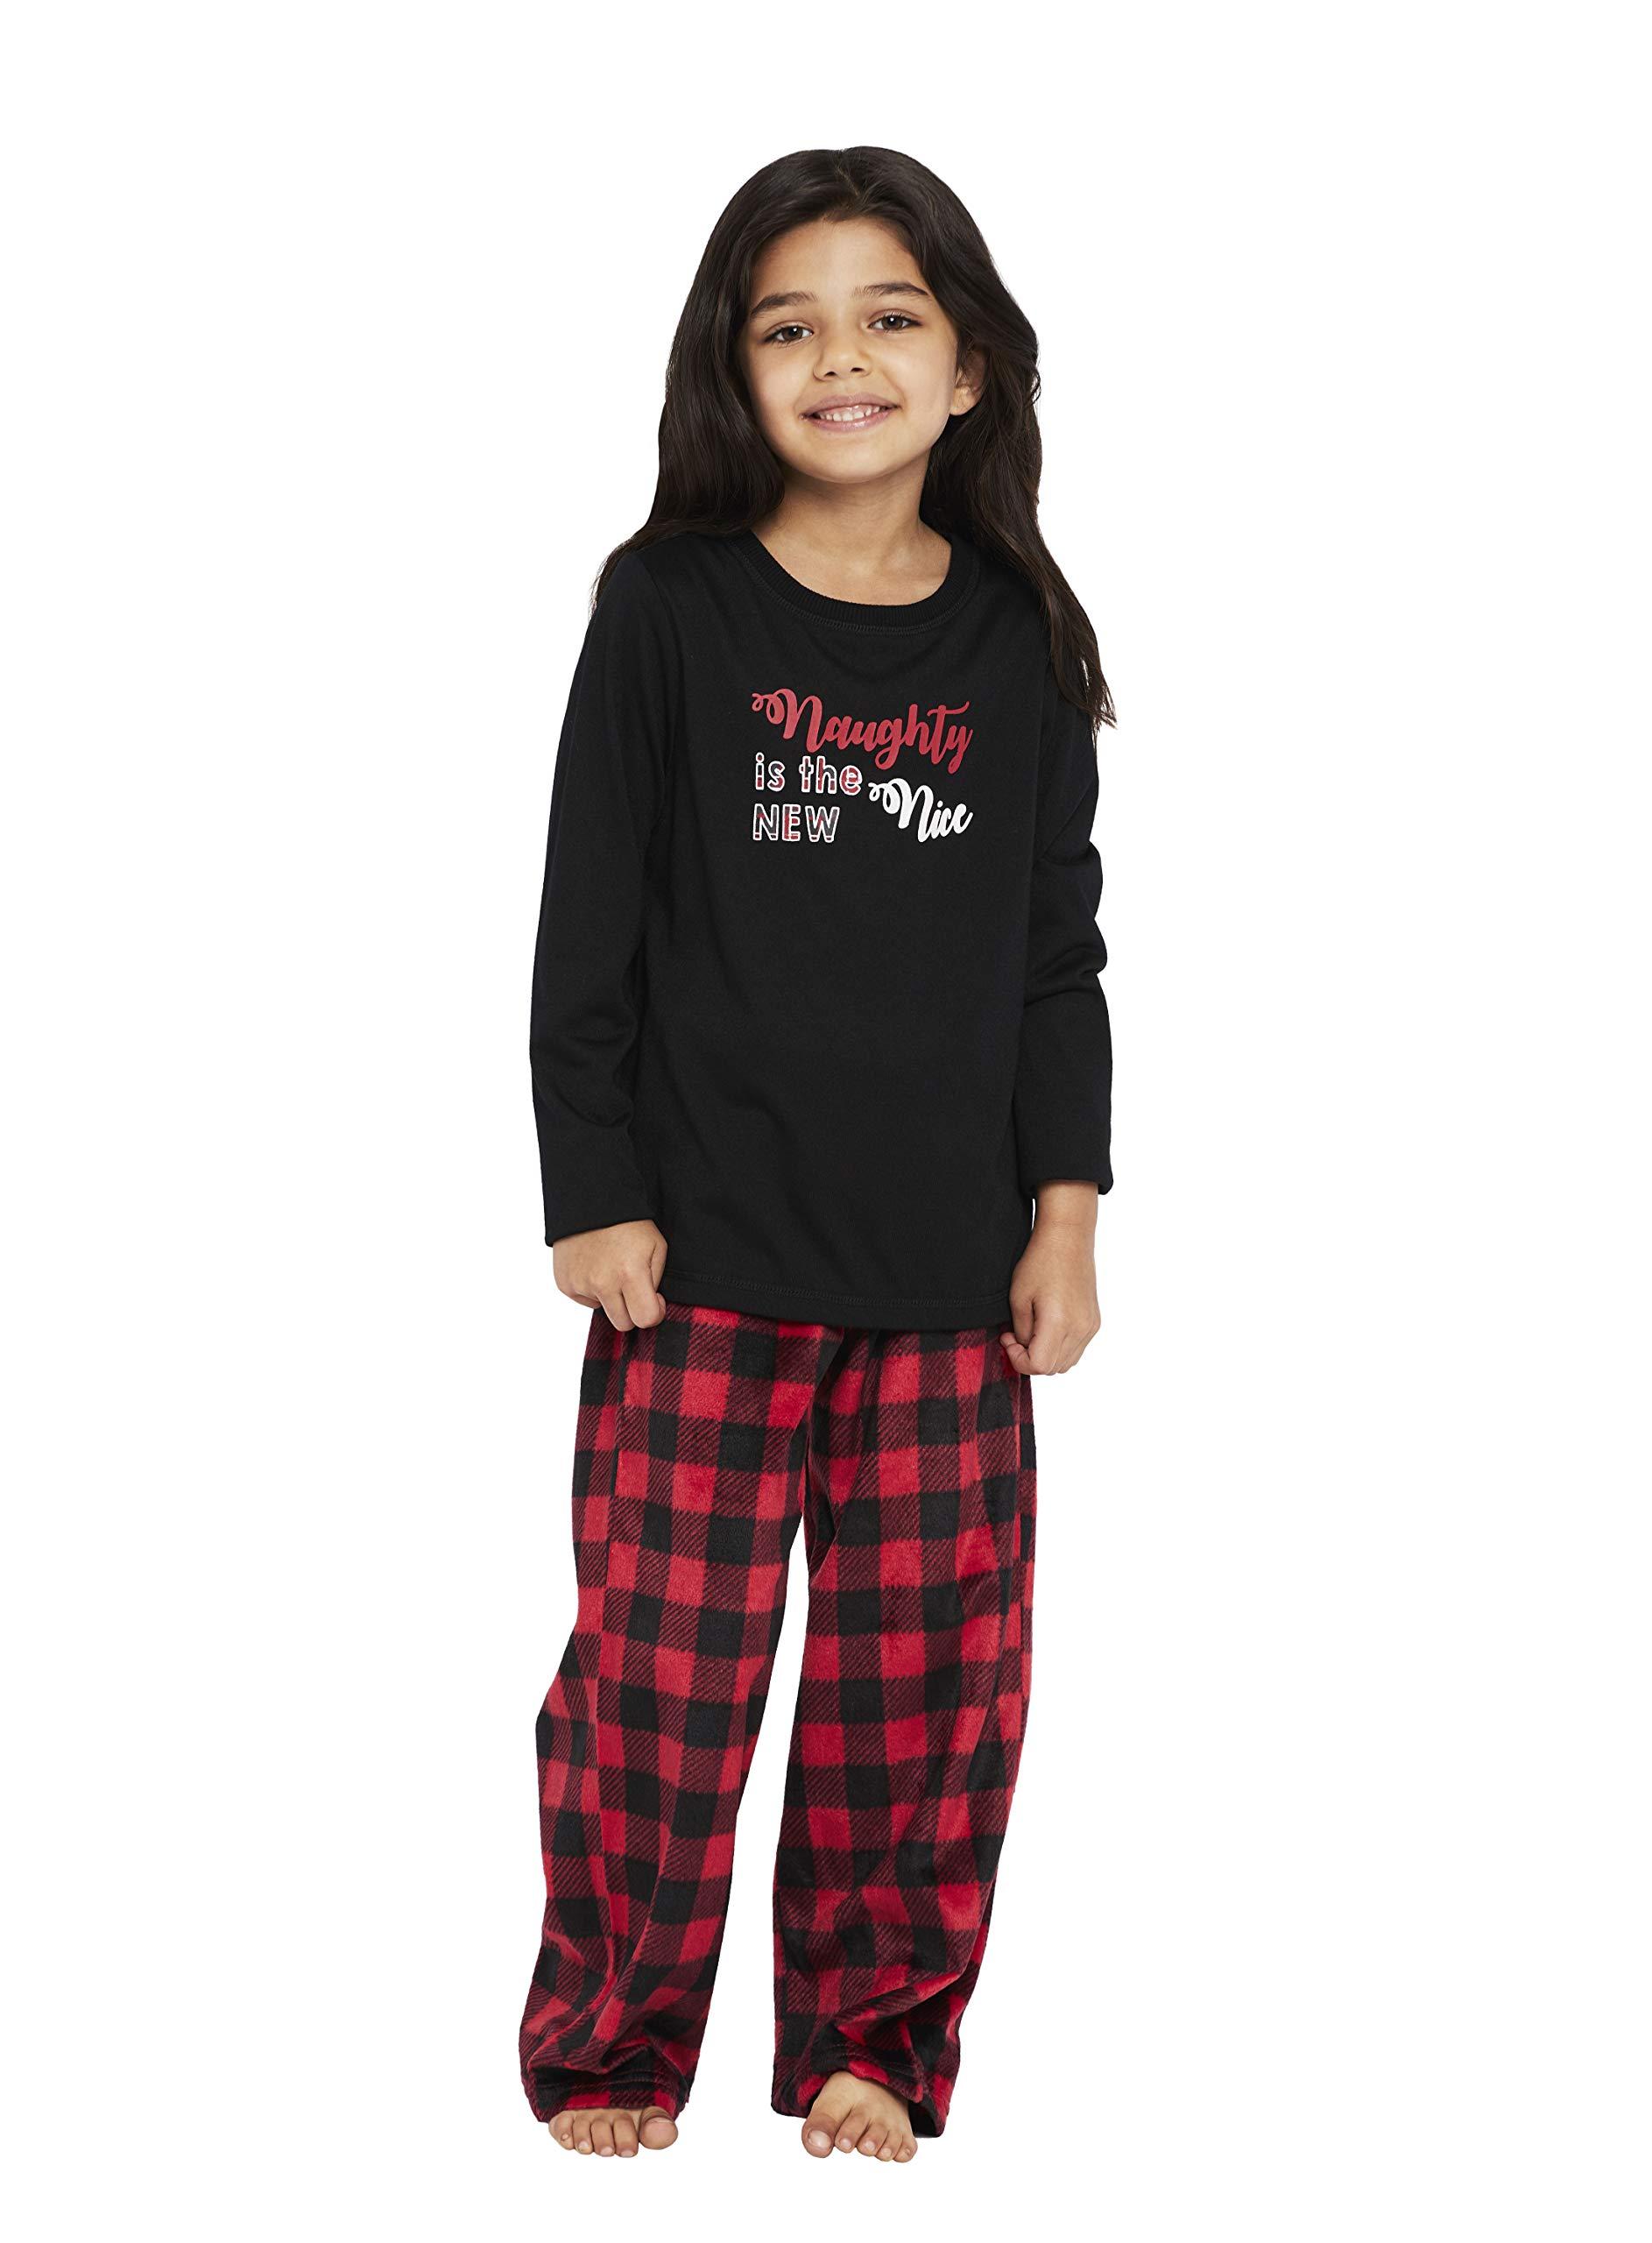 Karen Neuburger Girls' Little Family Matching Christmas Holiday Pajama Sets PJ, Buffalo Plaid red Cherry/Black Combo, Kid M by Karen Neuburger (Image #3)